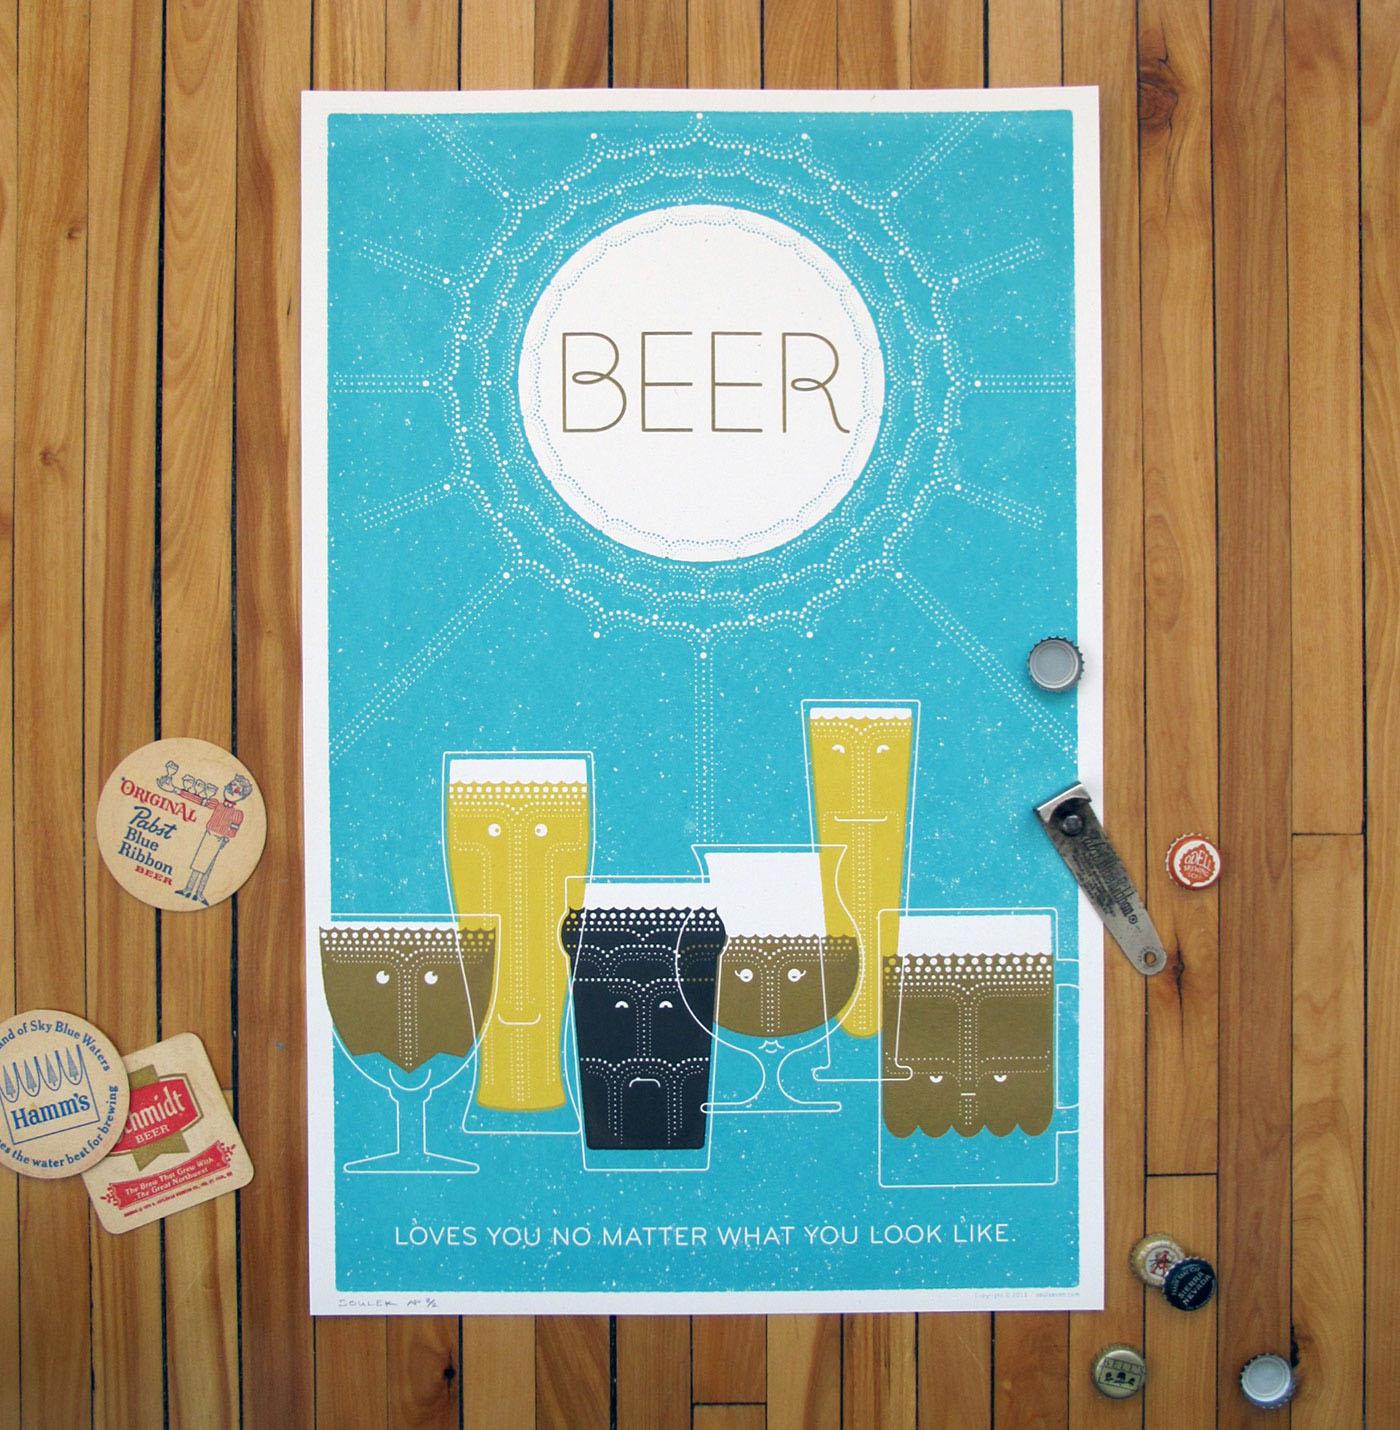 Soulseven Sam Soulek beer posters tshirts screen printing letterpress Red Bull